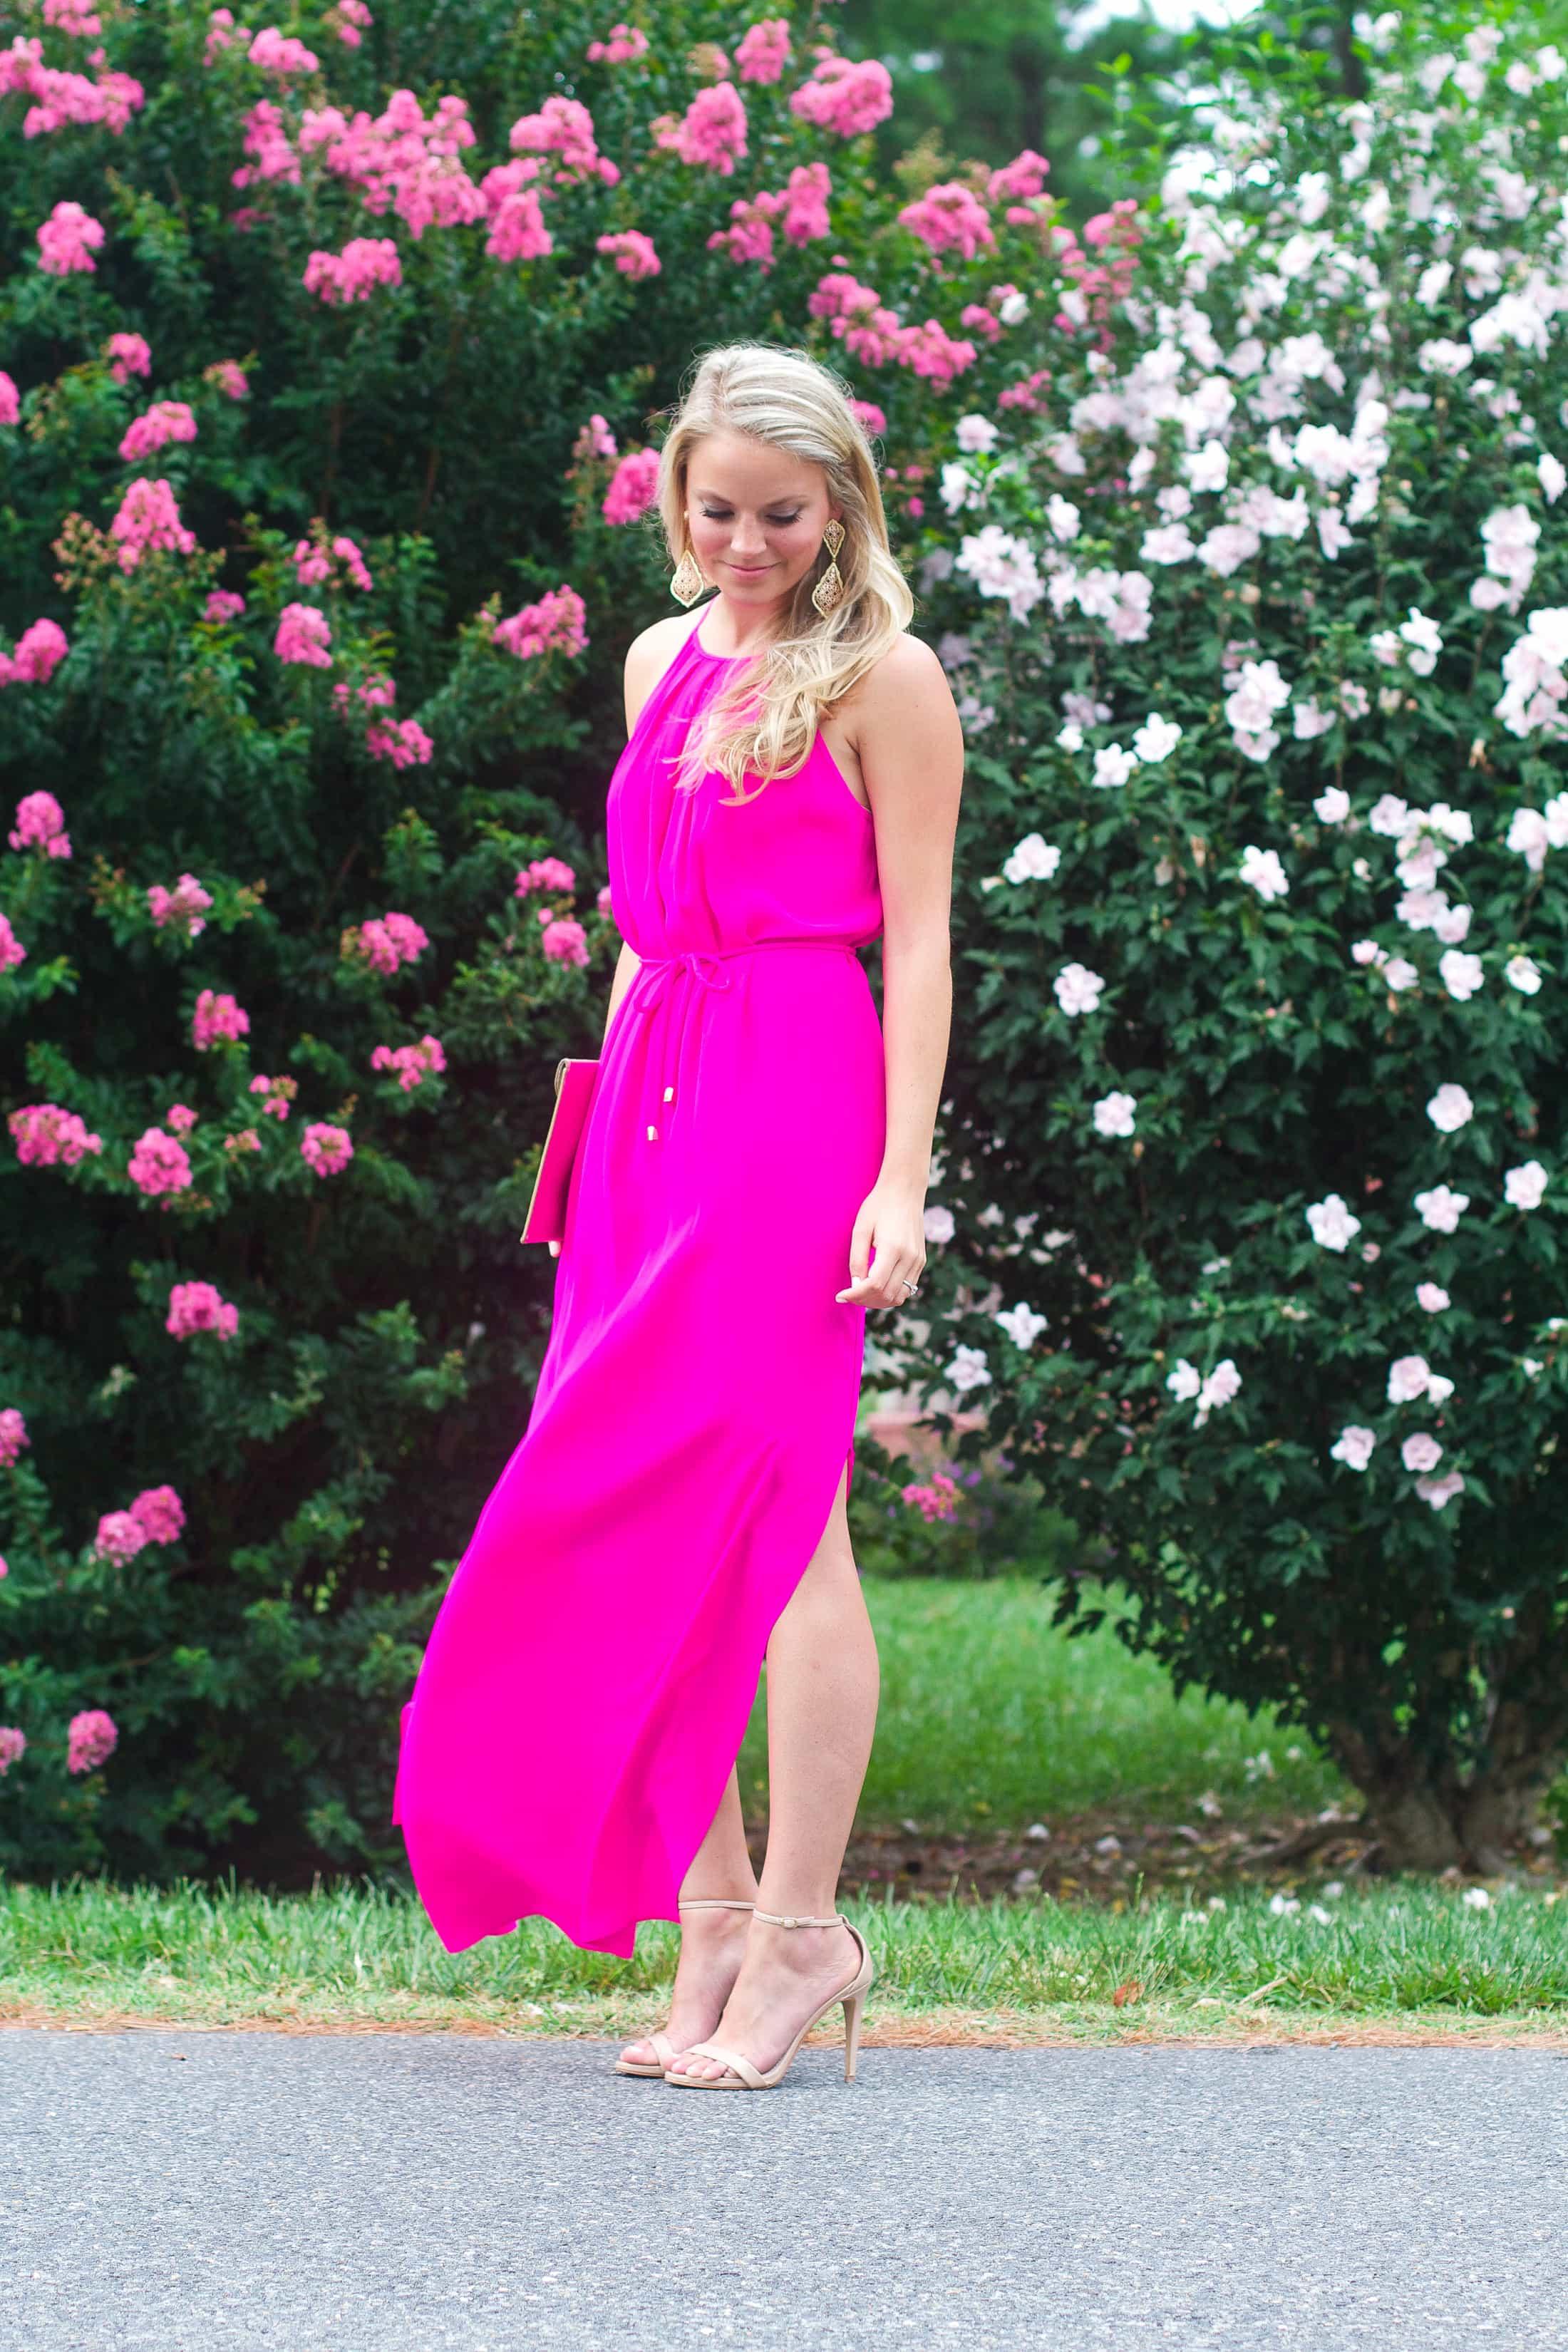 PINK MAXI DRESS Styled Snapshots